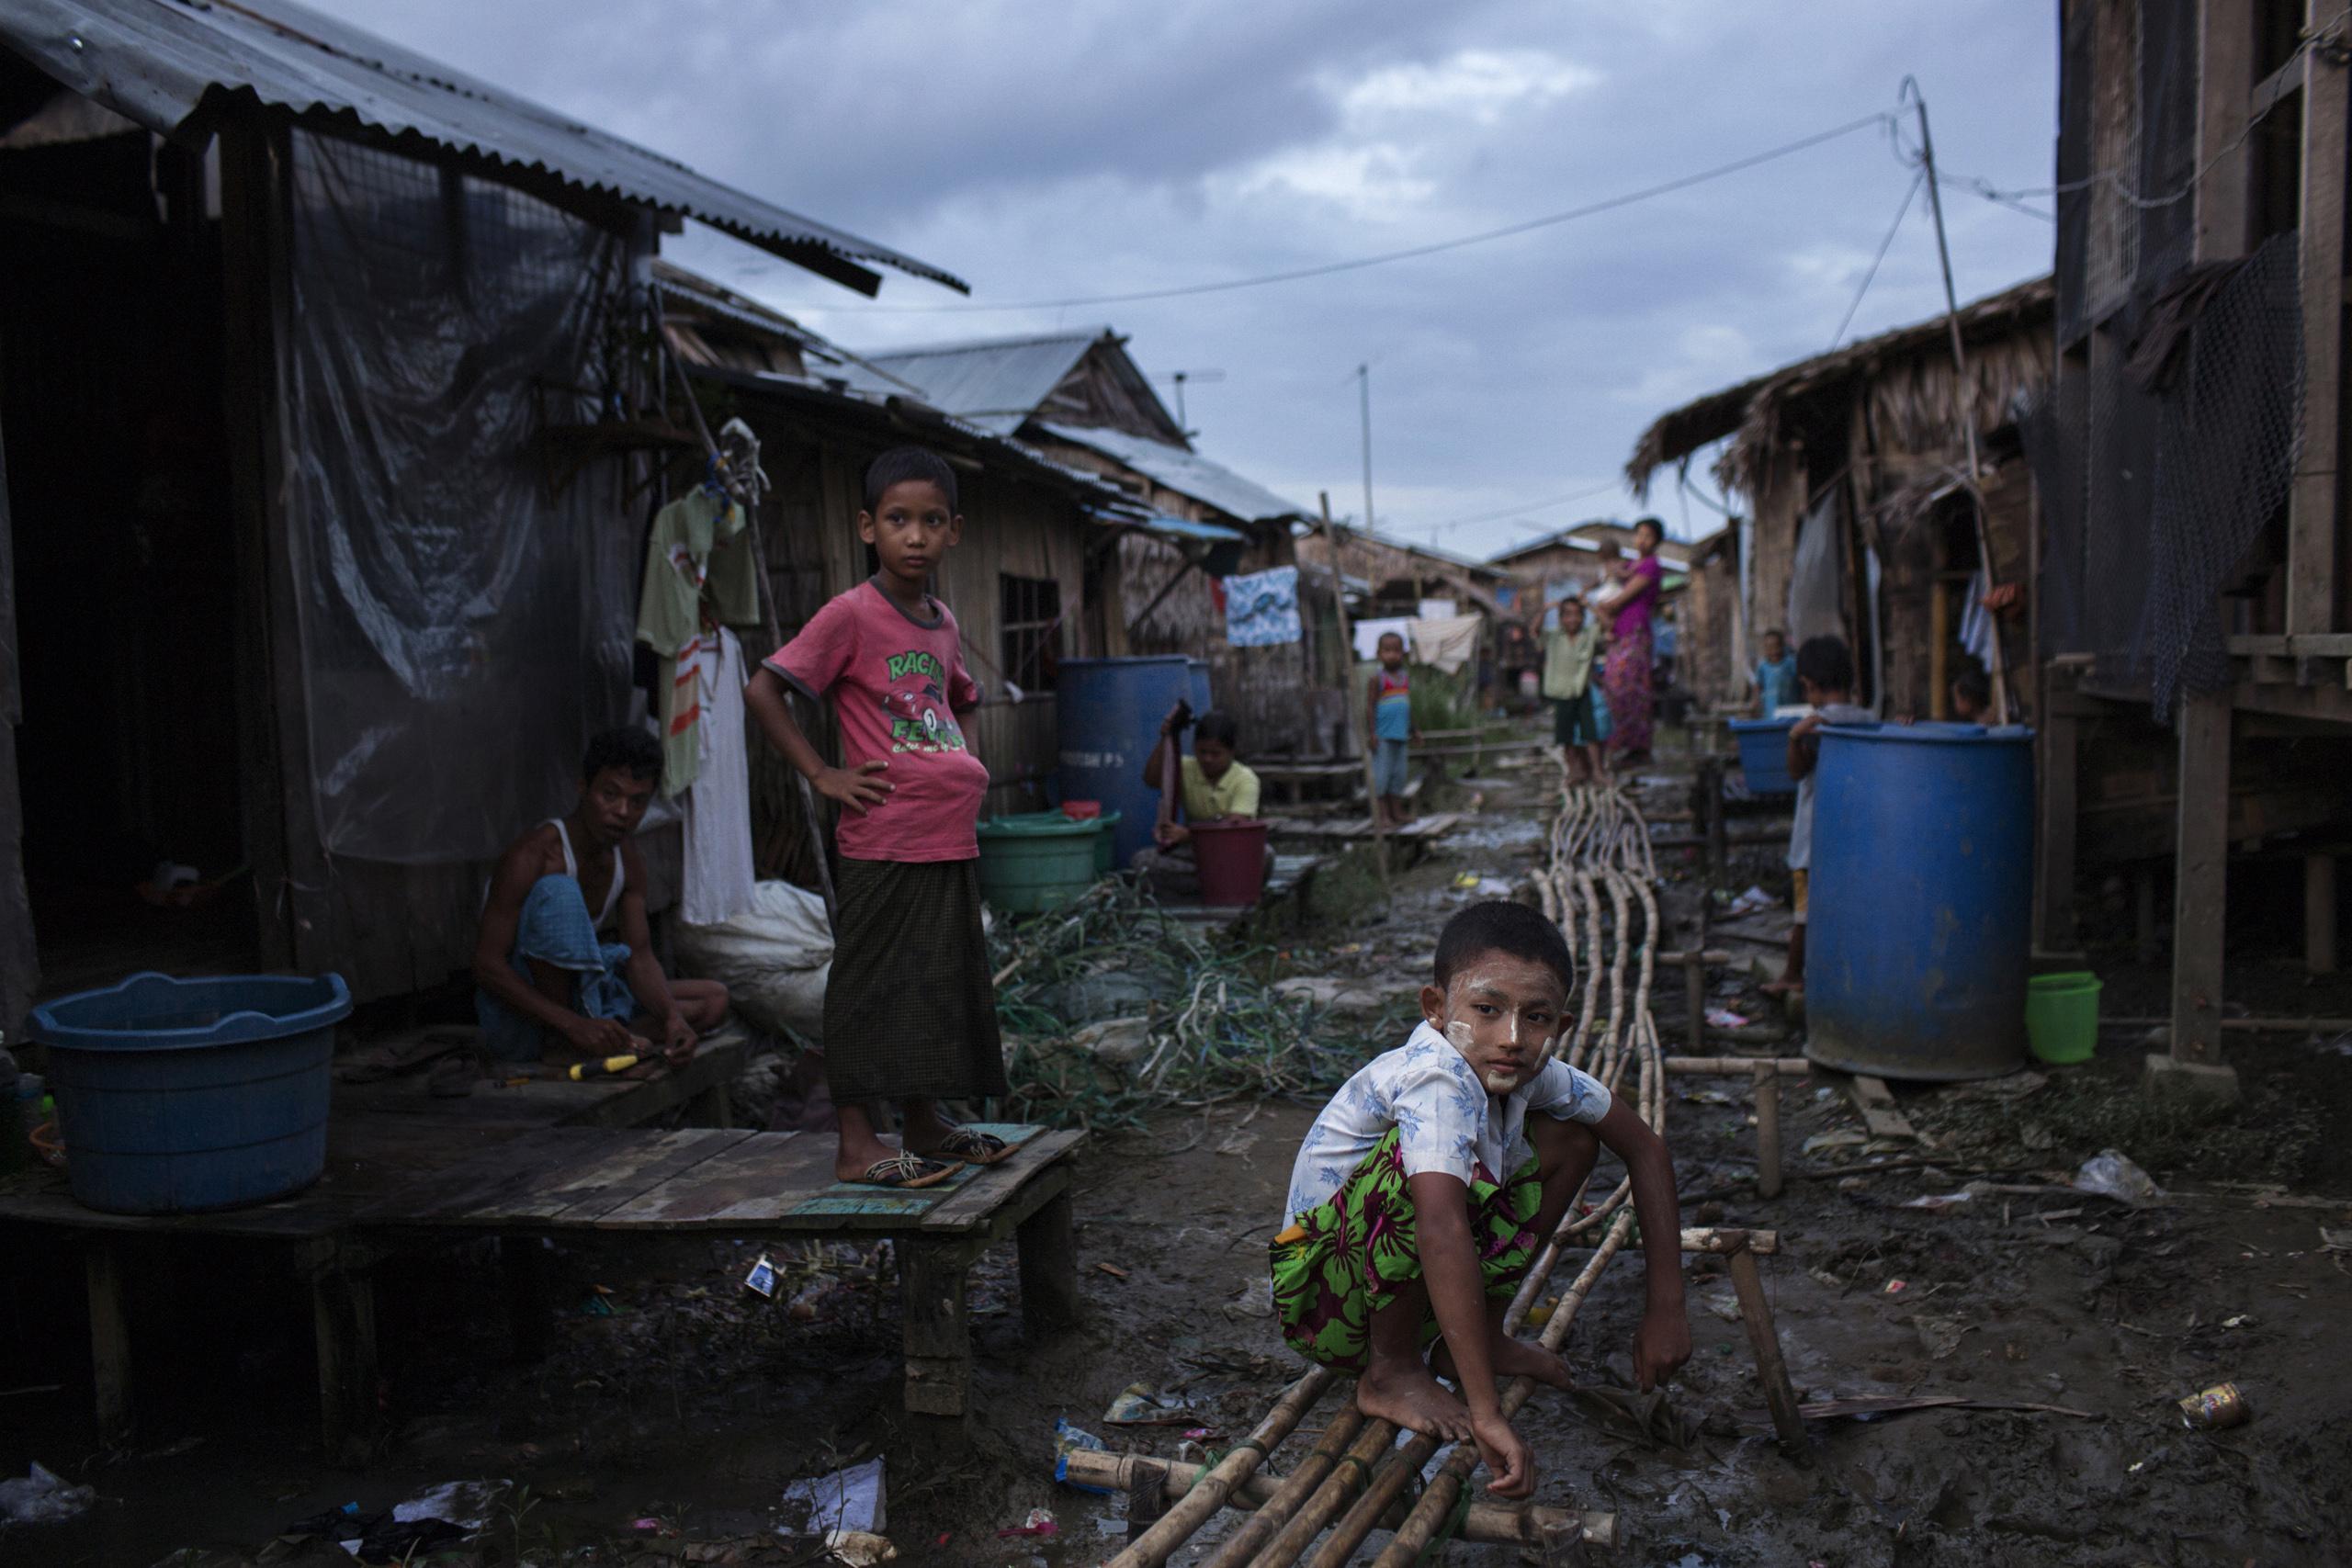 Children are seen in Daw Pon,  near Thilawa Special Economic Zone  near Yangon, Burma, Sept. 20, 2014.